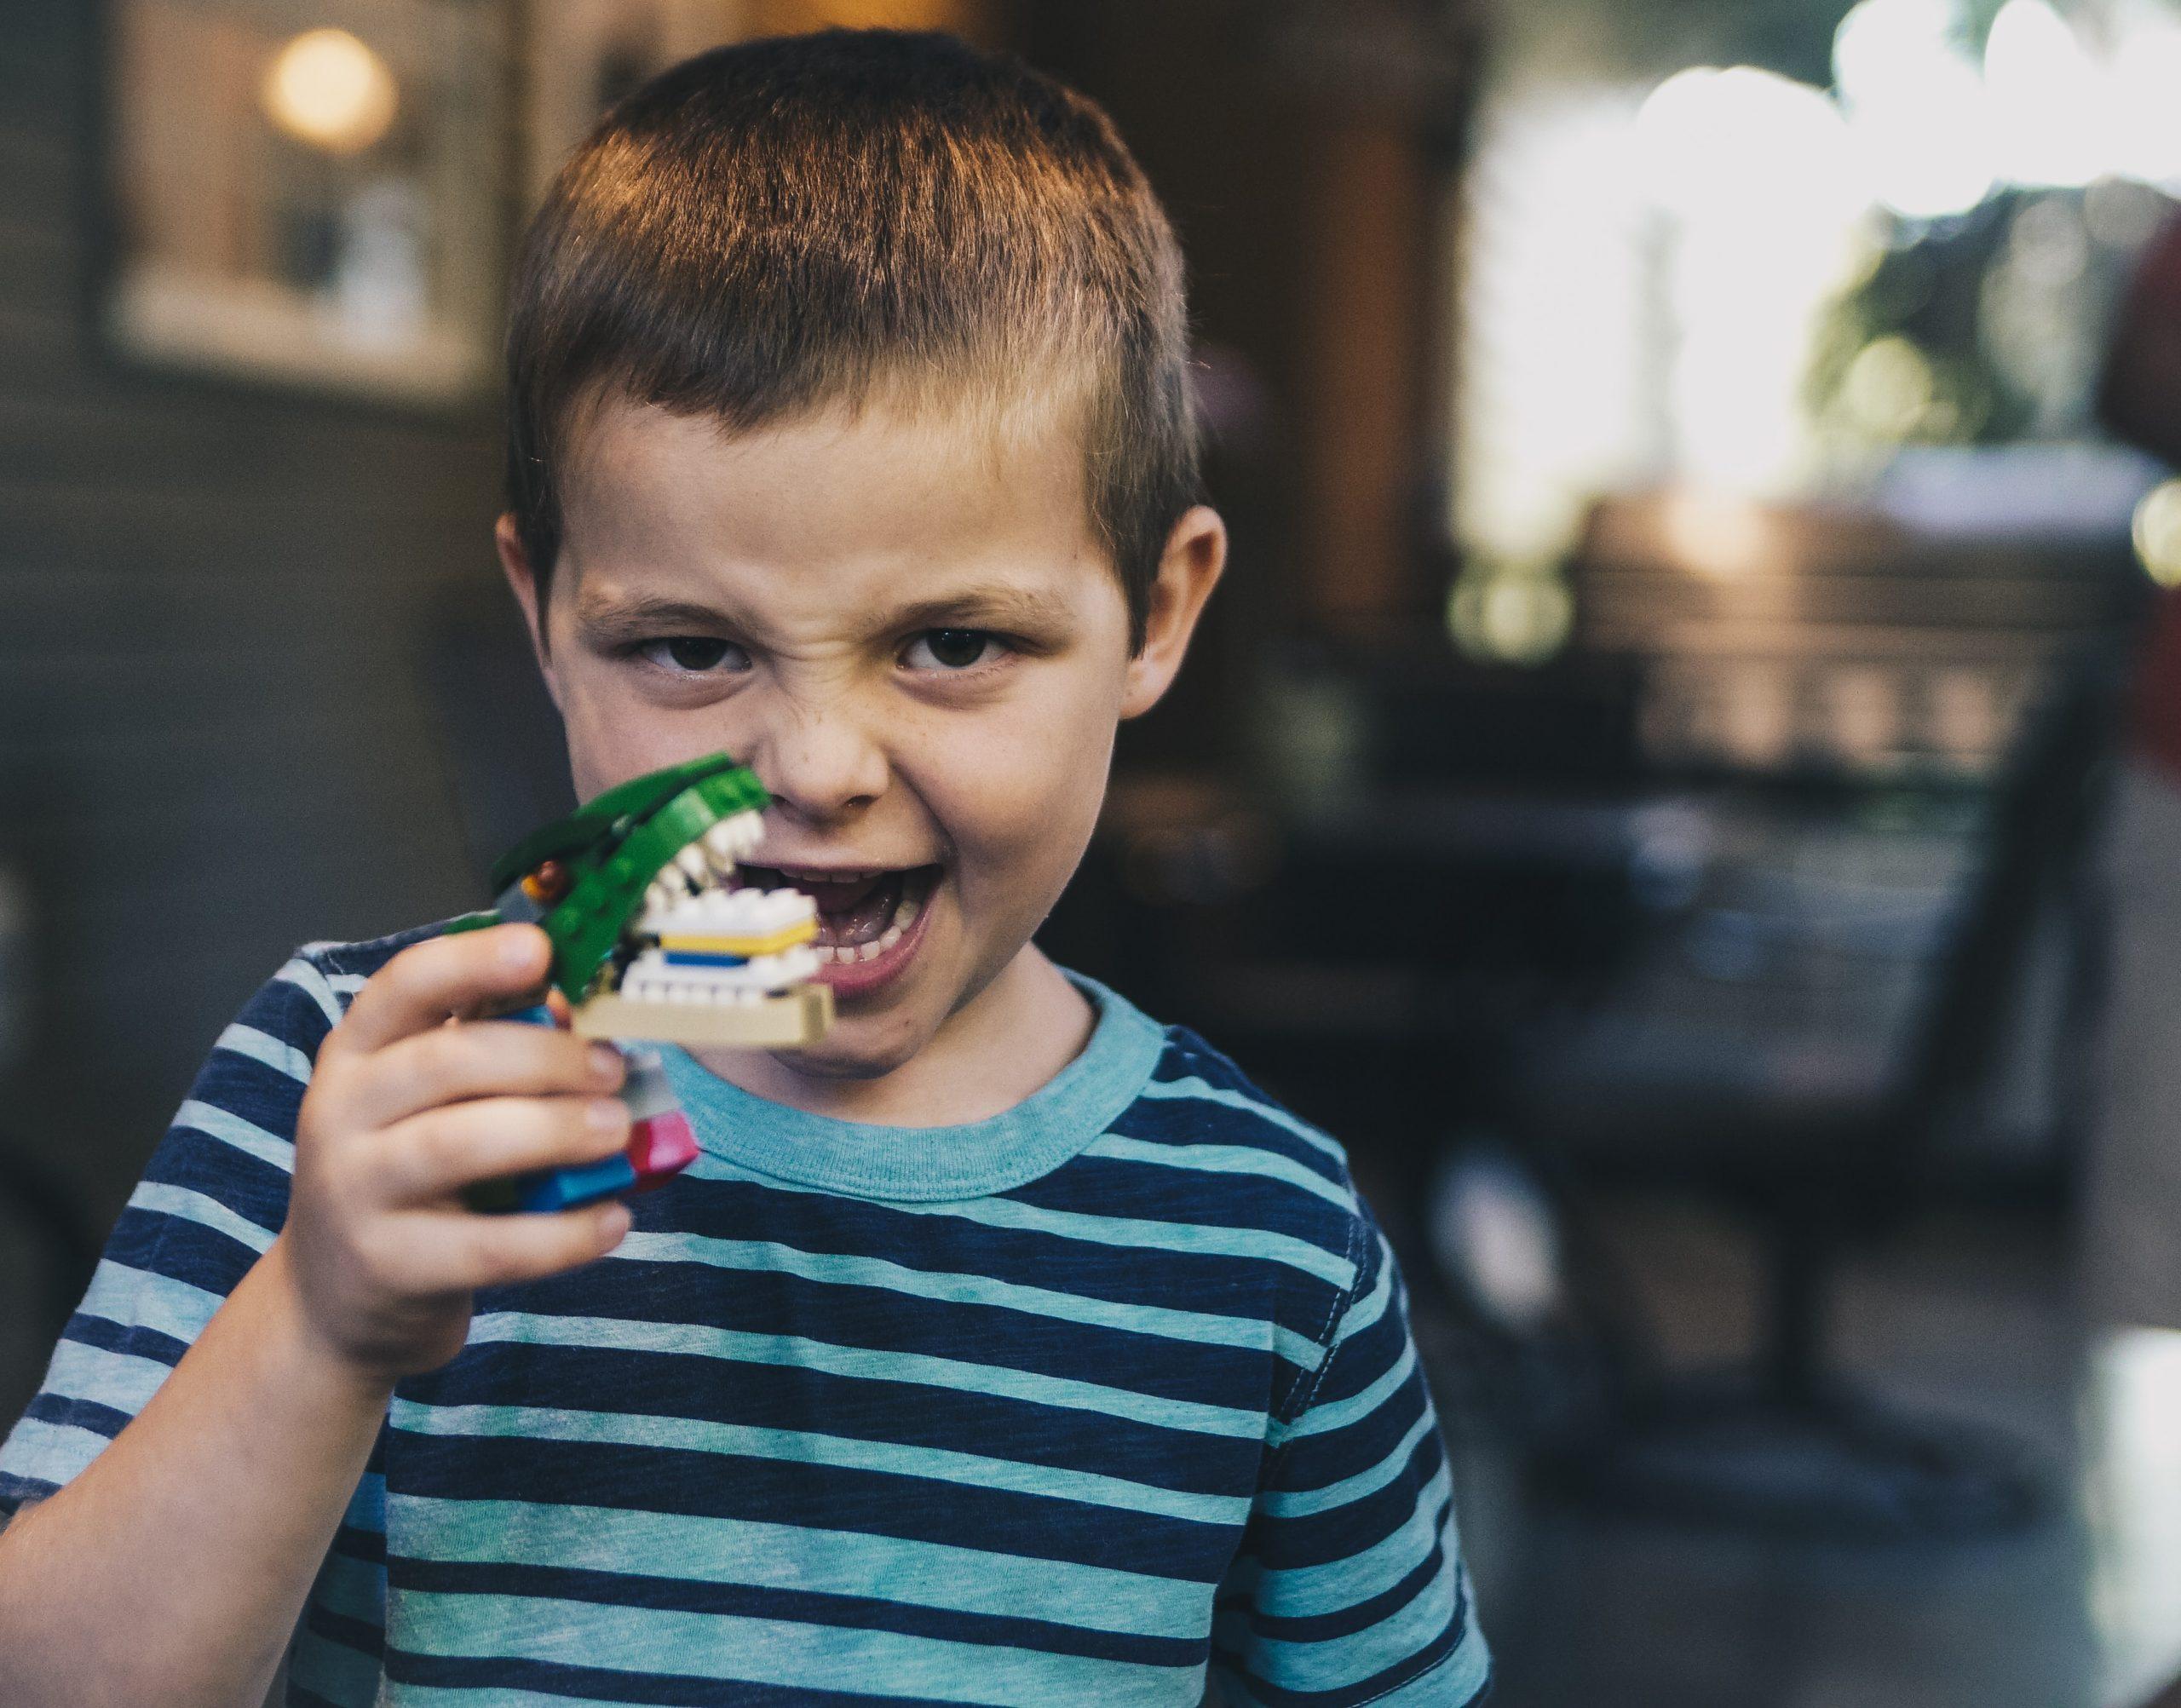 higiene bucal de tus hijos - Clínica Dental Adalia